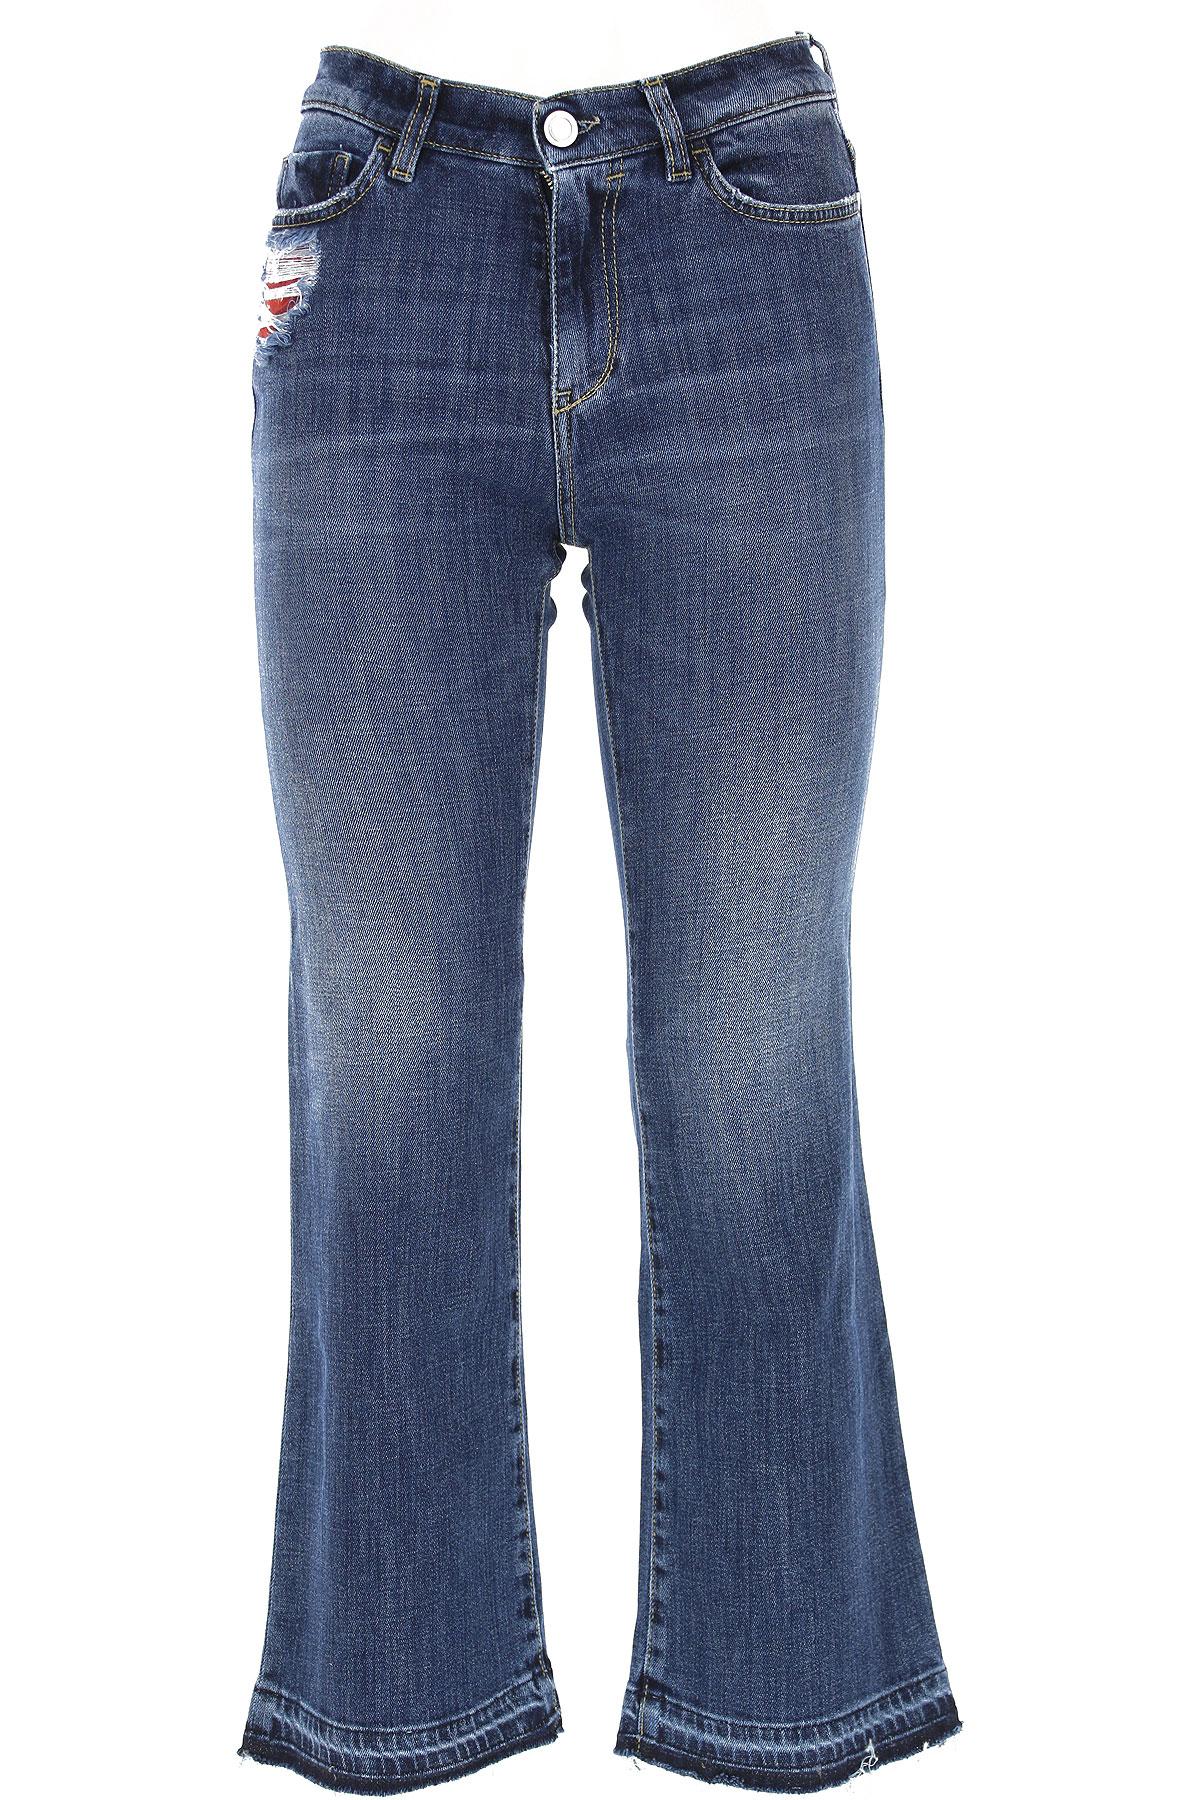 Pinko Jeans On Sale, Denim, Cotton, 2017, 26 27 29